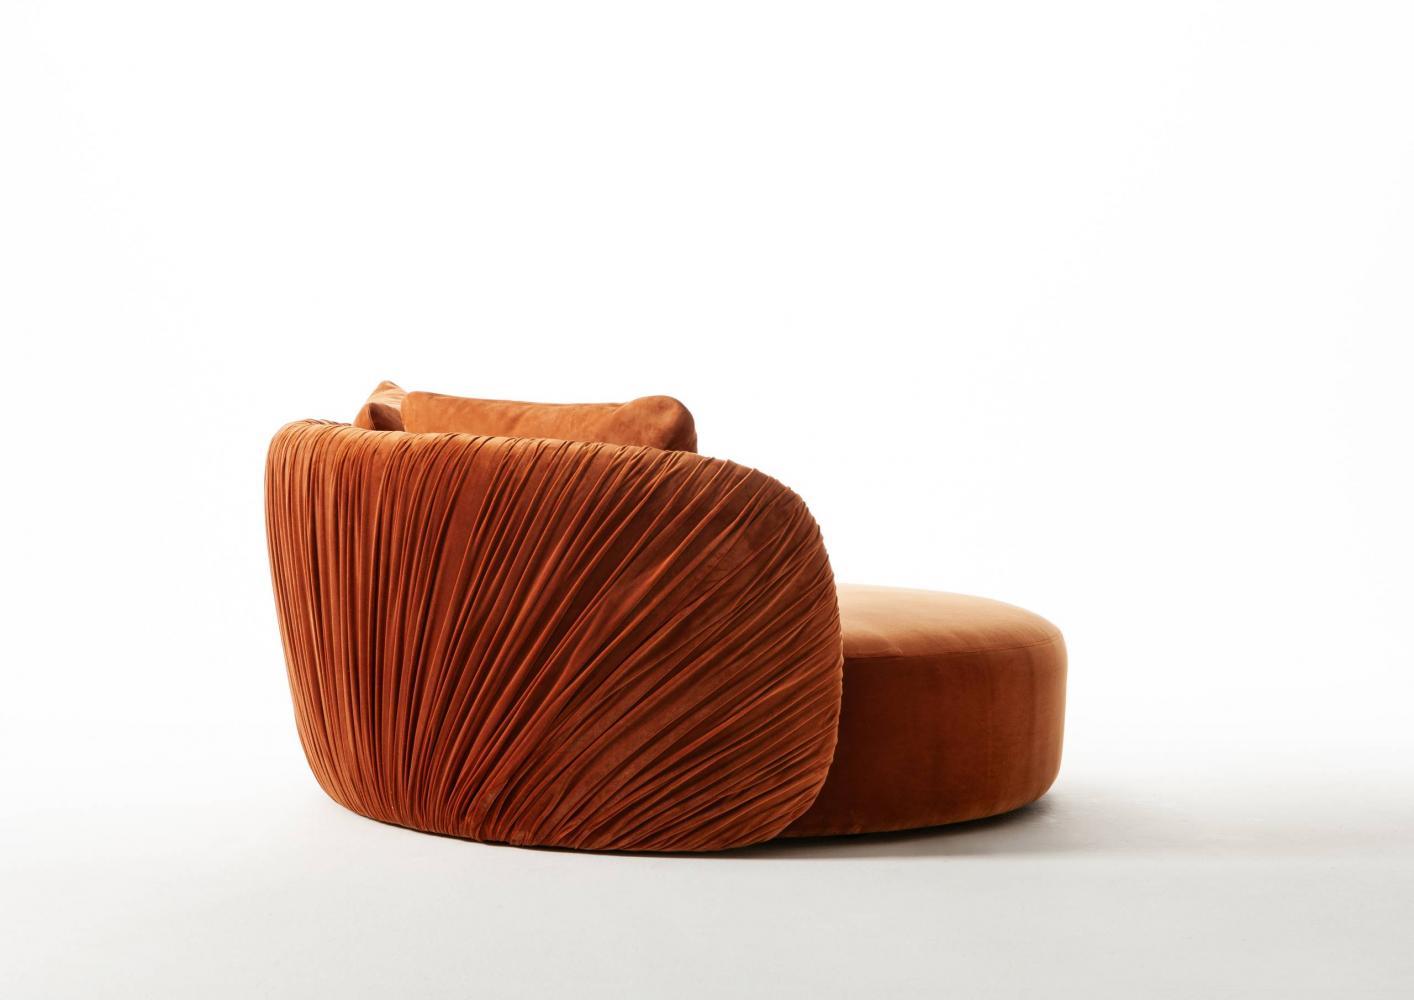 Drapè Round leather or velvet luxuxy rounded sofa with handmade pleats design